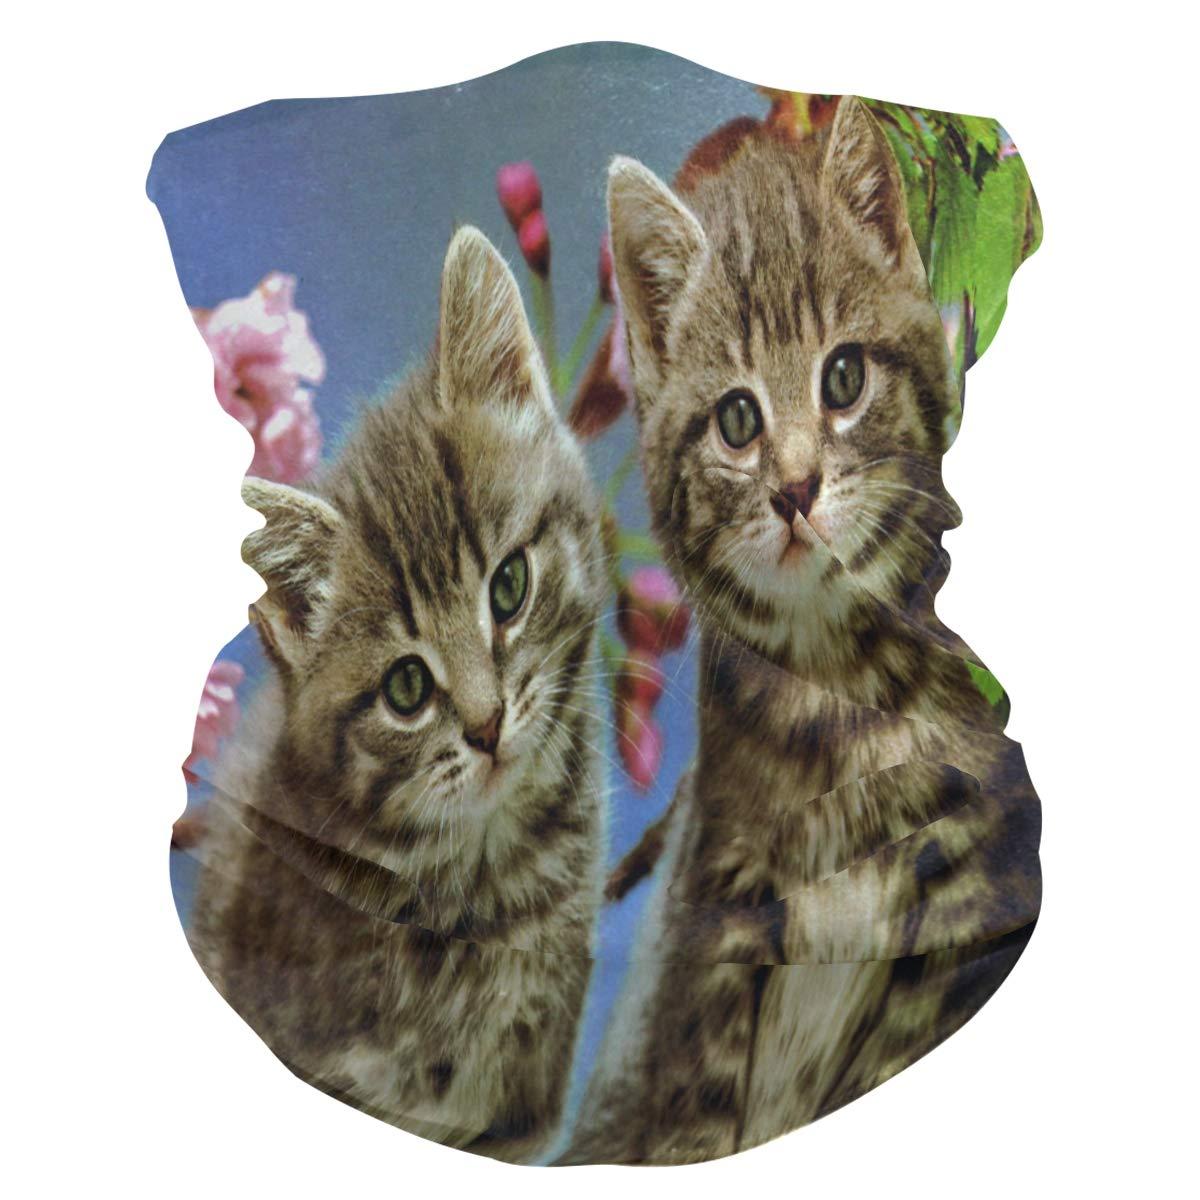 I LOVE ANIMALS Cats Face Mask Bandanas UV Protection Neck Gaiter Breathable Anti Dust Masks